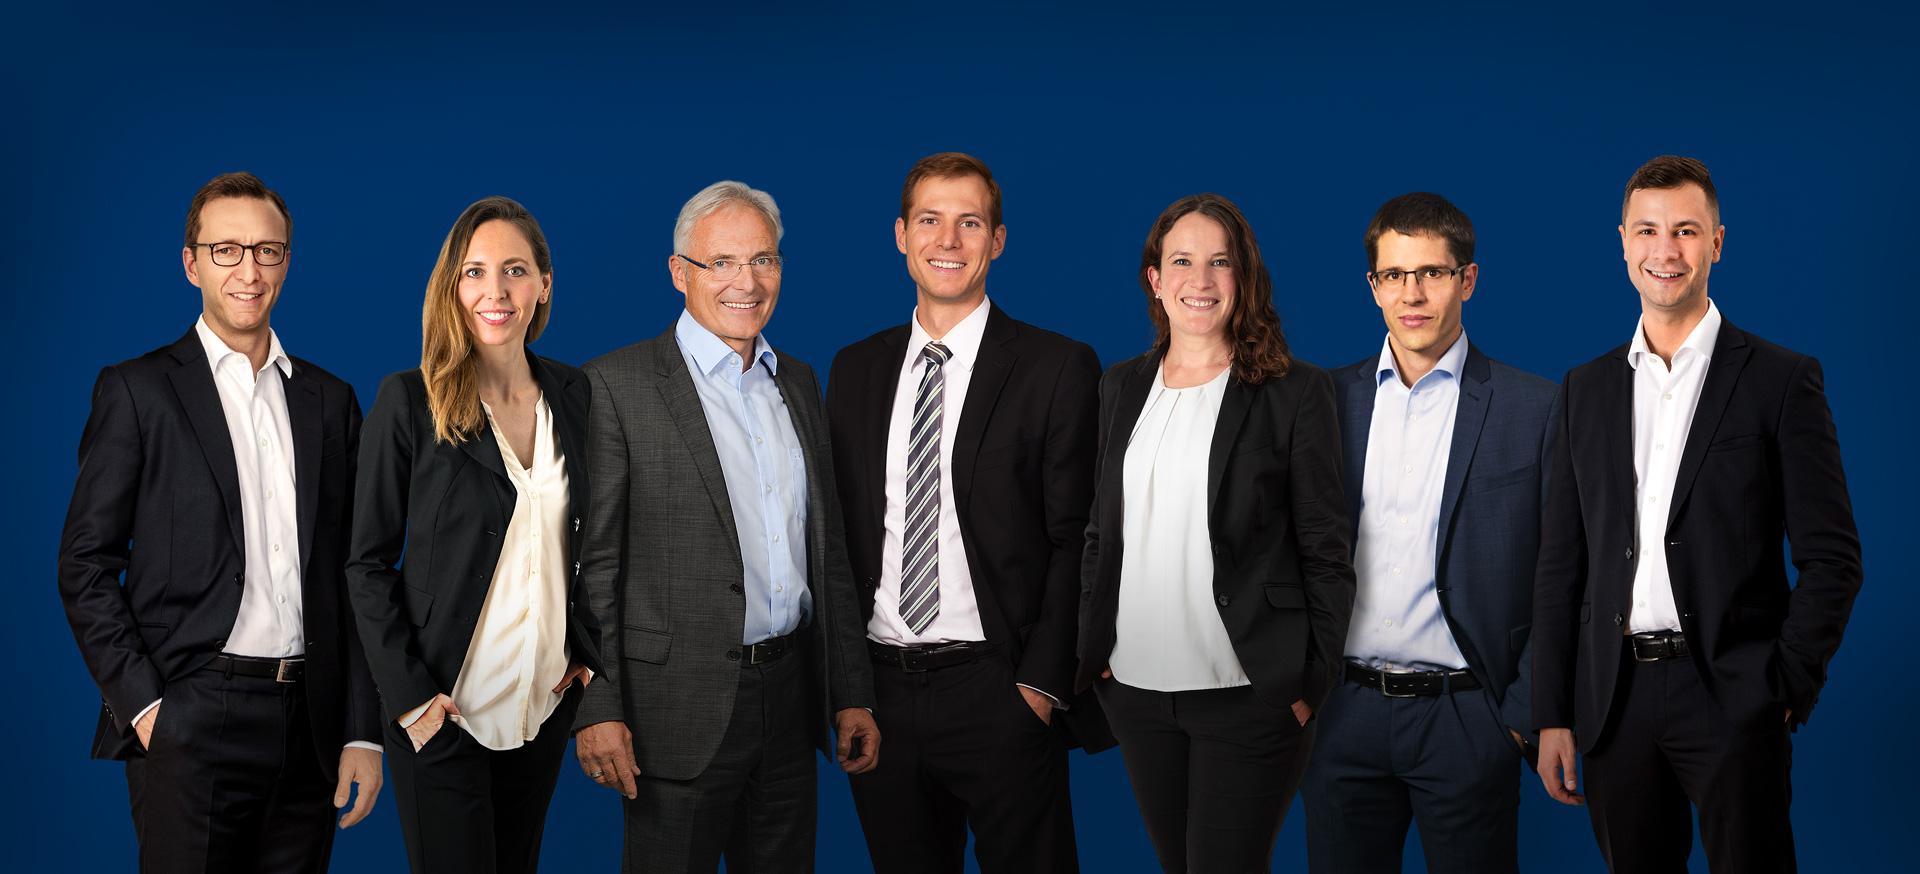 Team, Gruppenbild Ihrer EBERSPÄCHER Rechtsanwälte Böblingen, Sindelfingen, bundesweit. Rechtsanwalt Böblingen. Anwalt Böblingen. Anwaltskanzlei Böblingen.